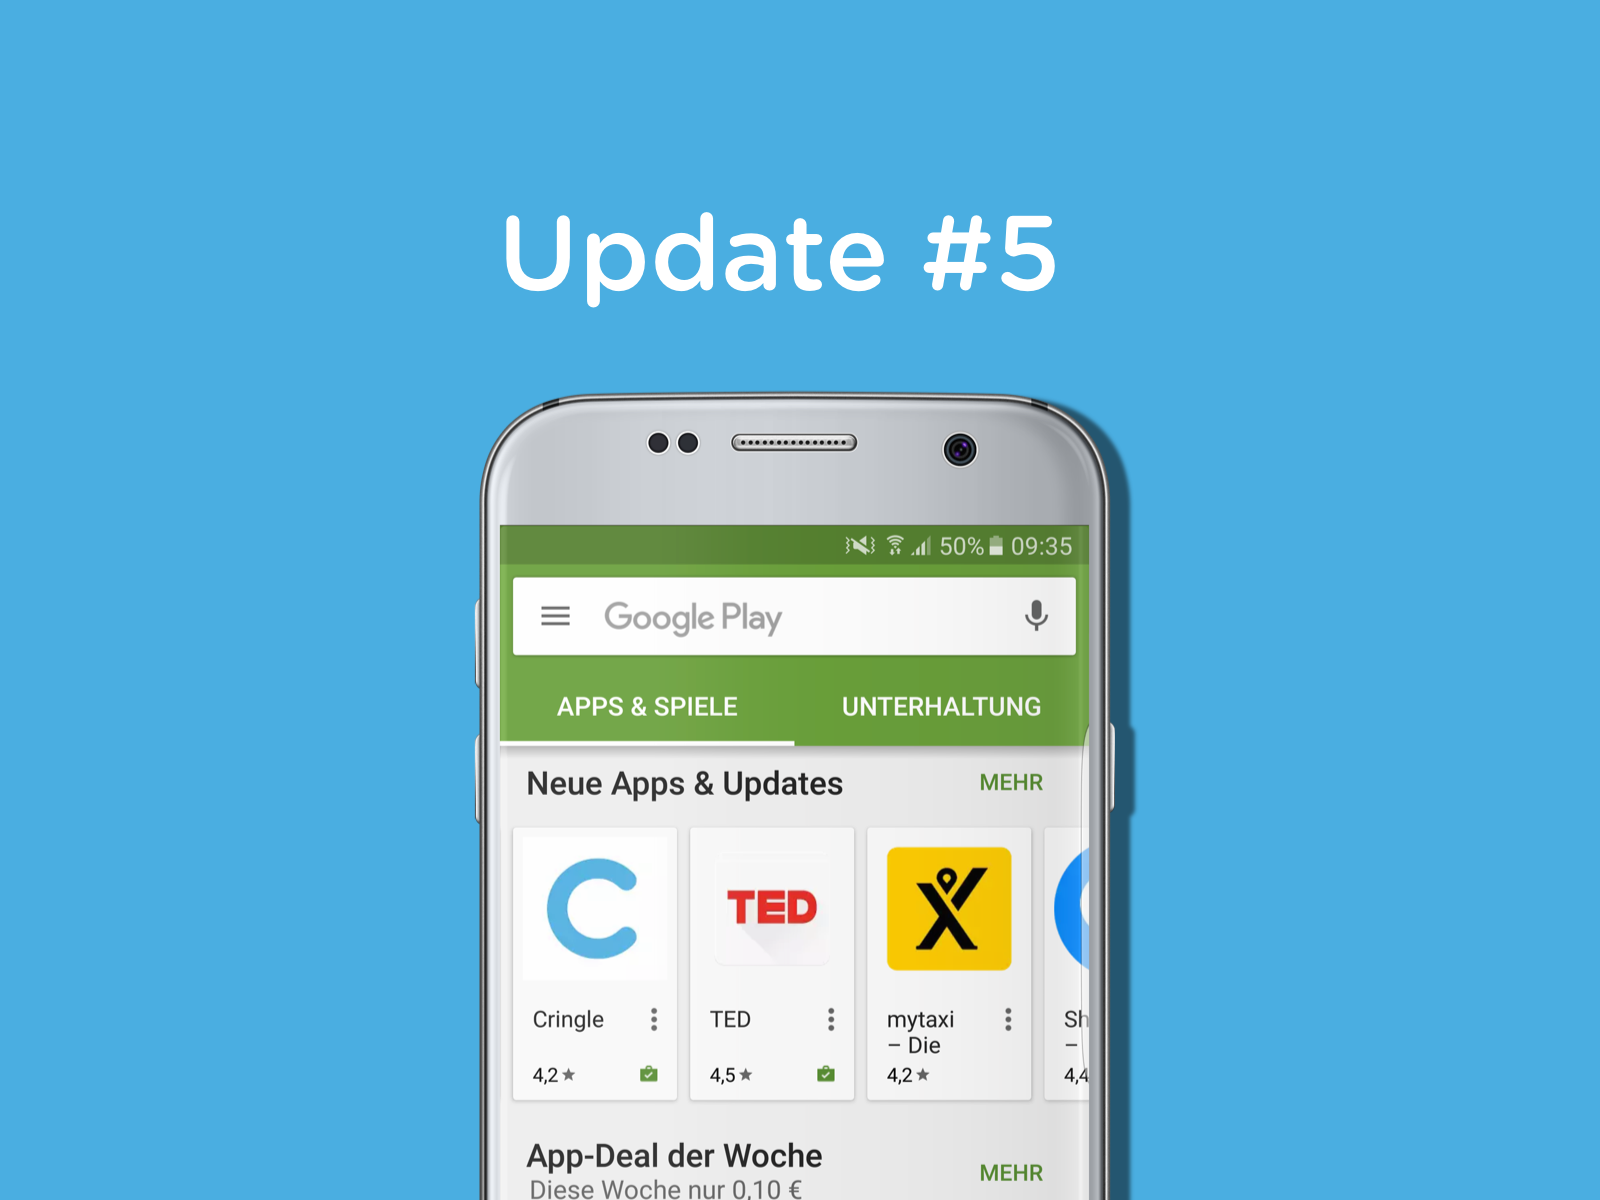 Cringle – Kollaboration mit Google Play